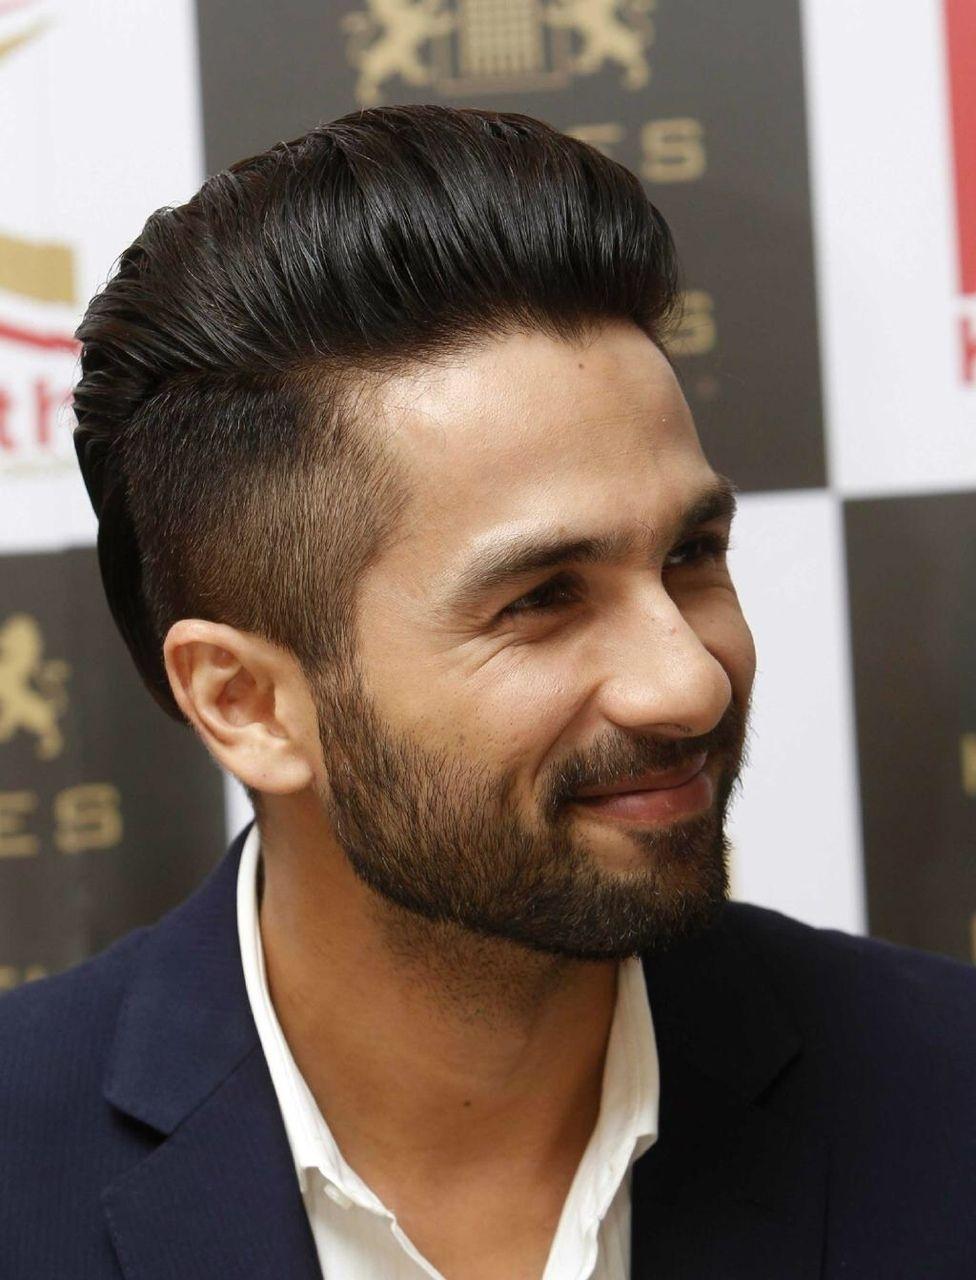 Indian New Hairstyle Mens Pics - Wavy Haircut